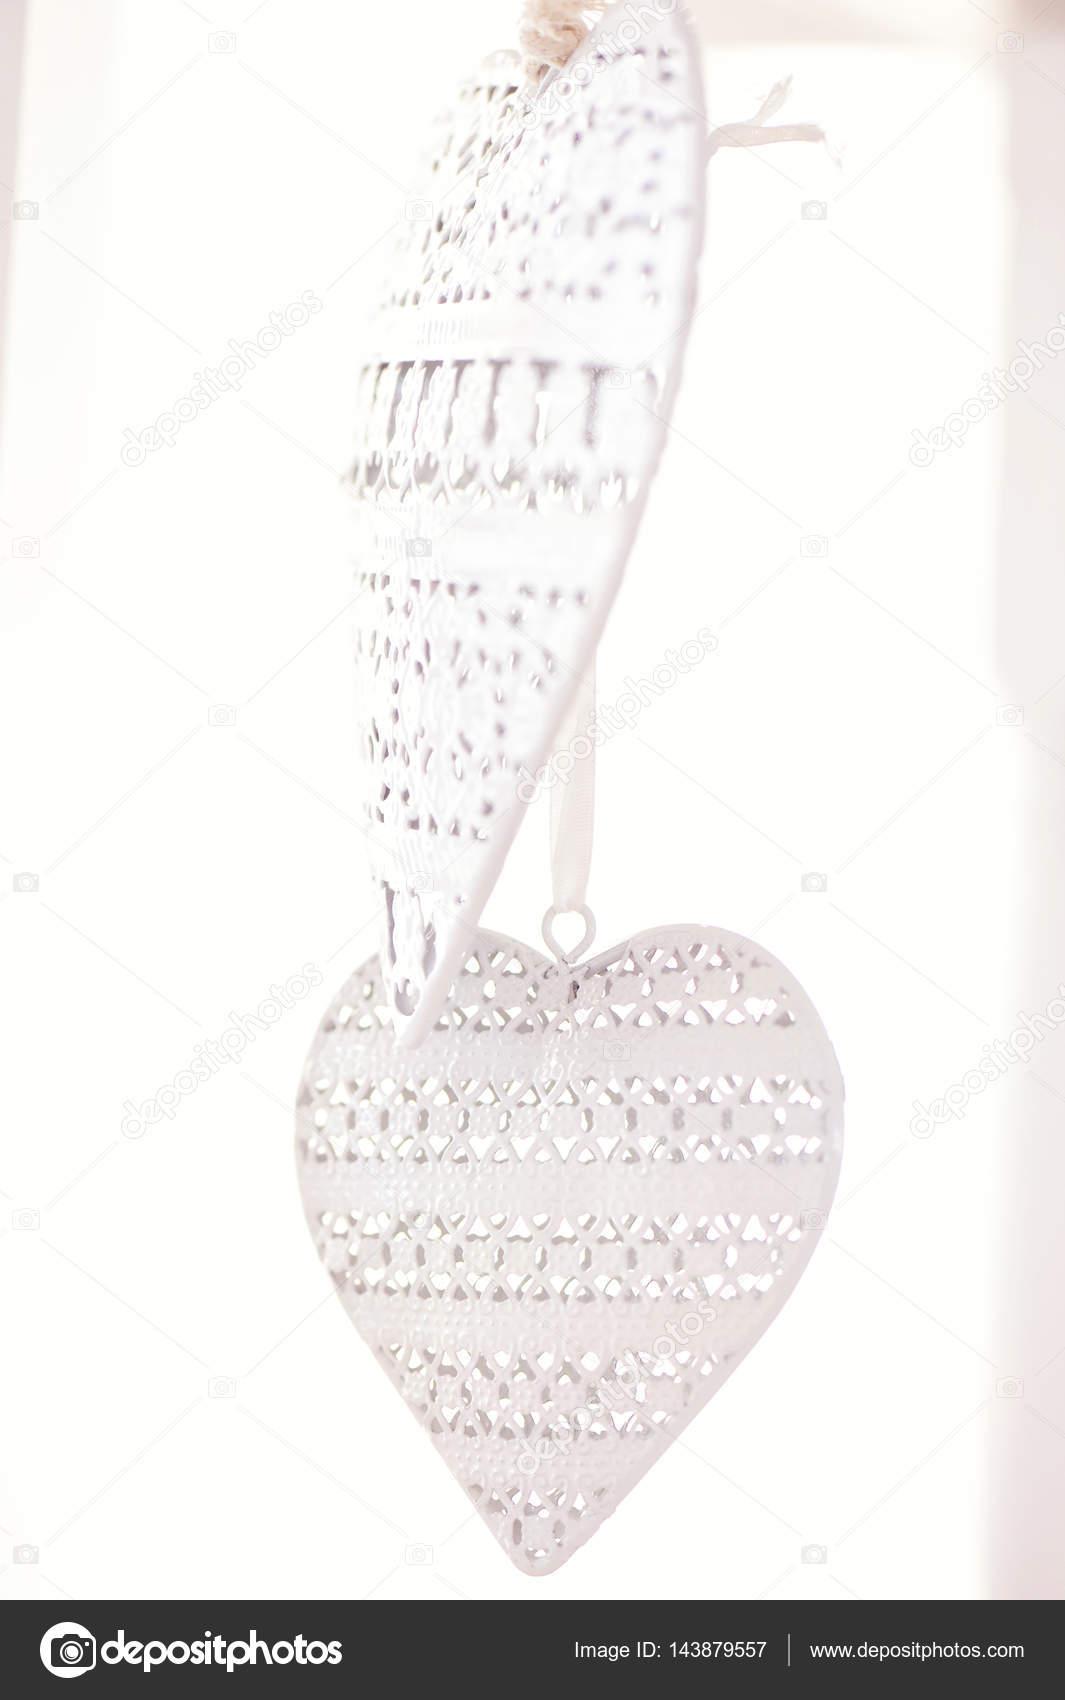 Großzügig Two Hearts Wedding Theme Galerie - Brautkleider Ideen ...